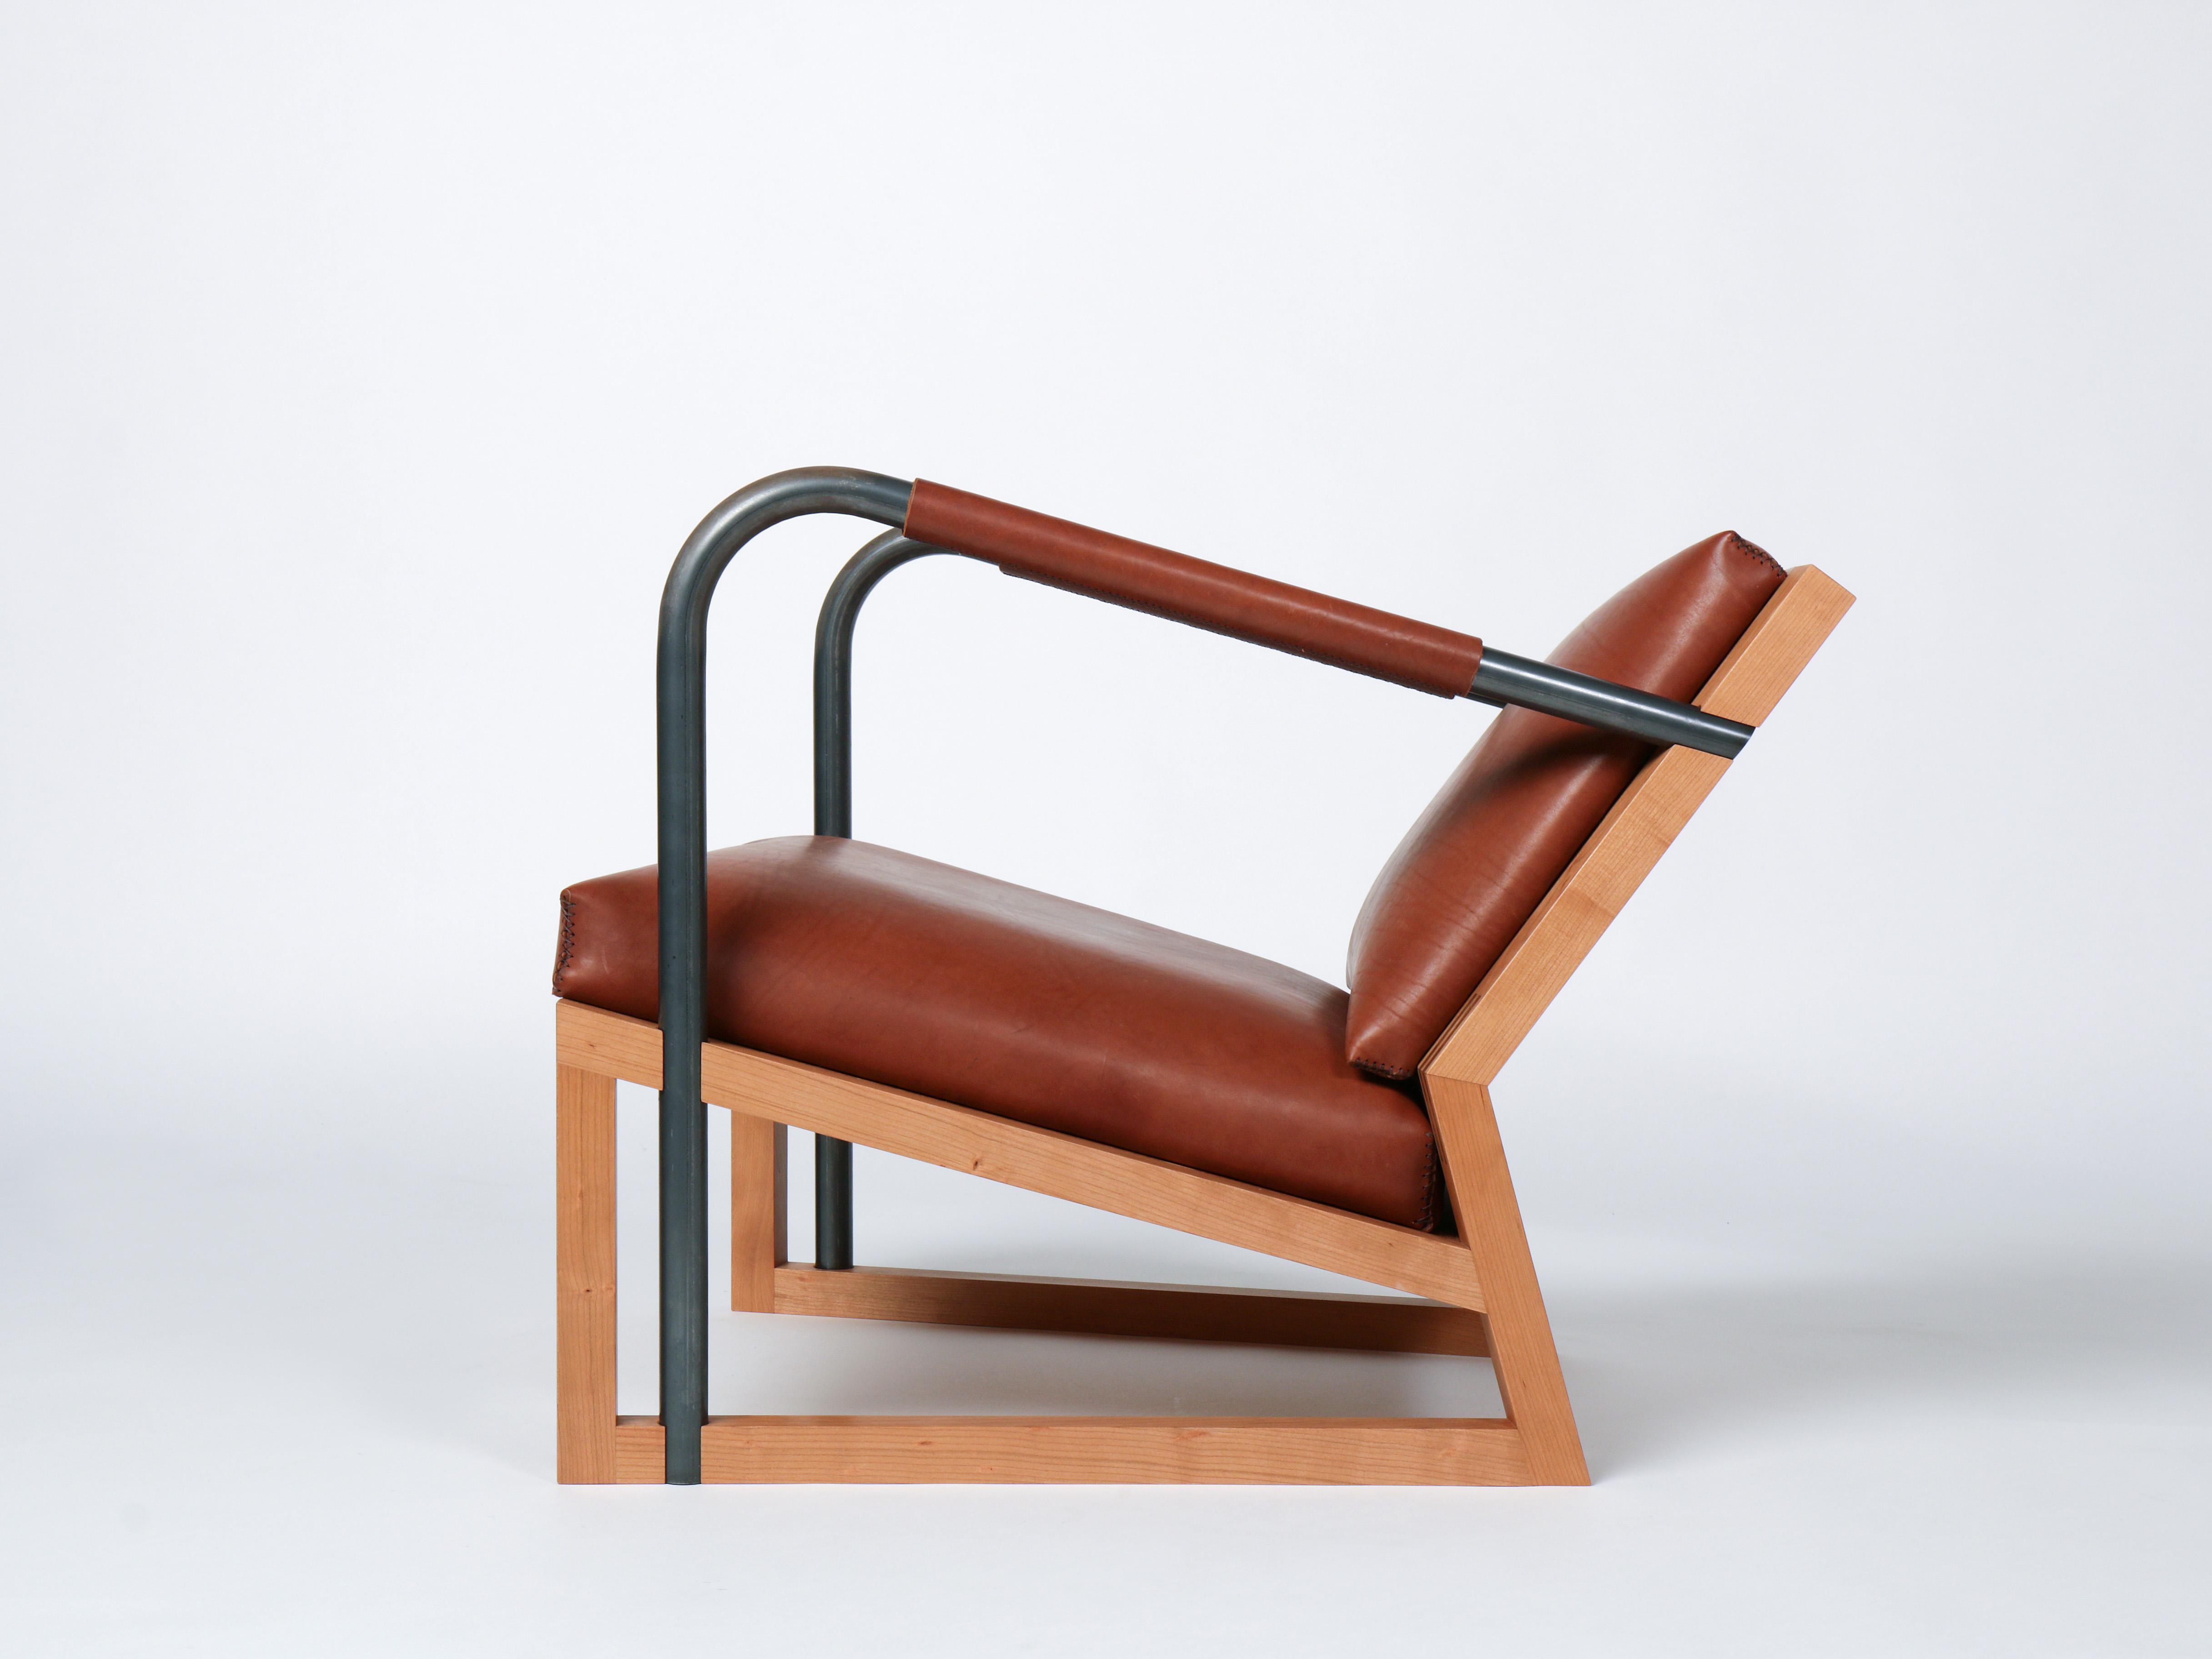 Möbelbau Berlin